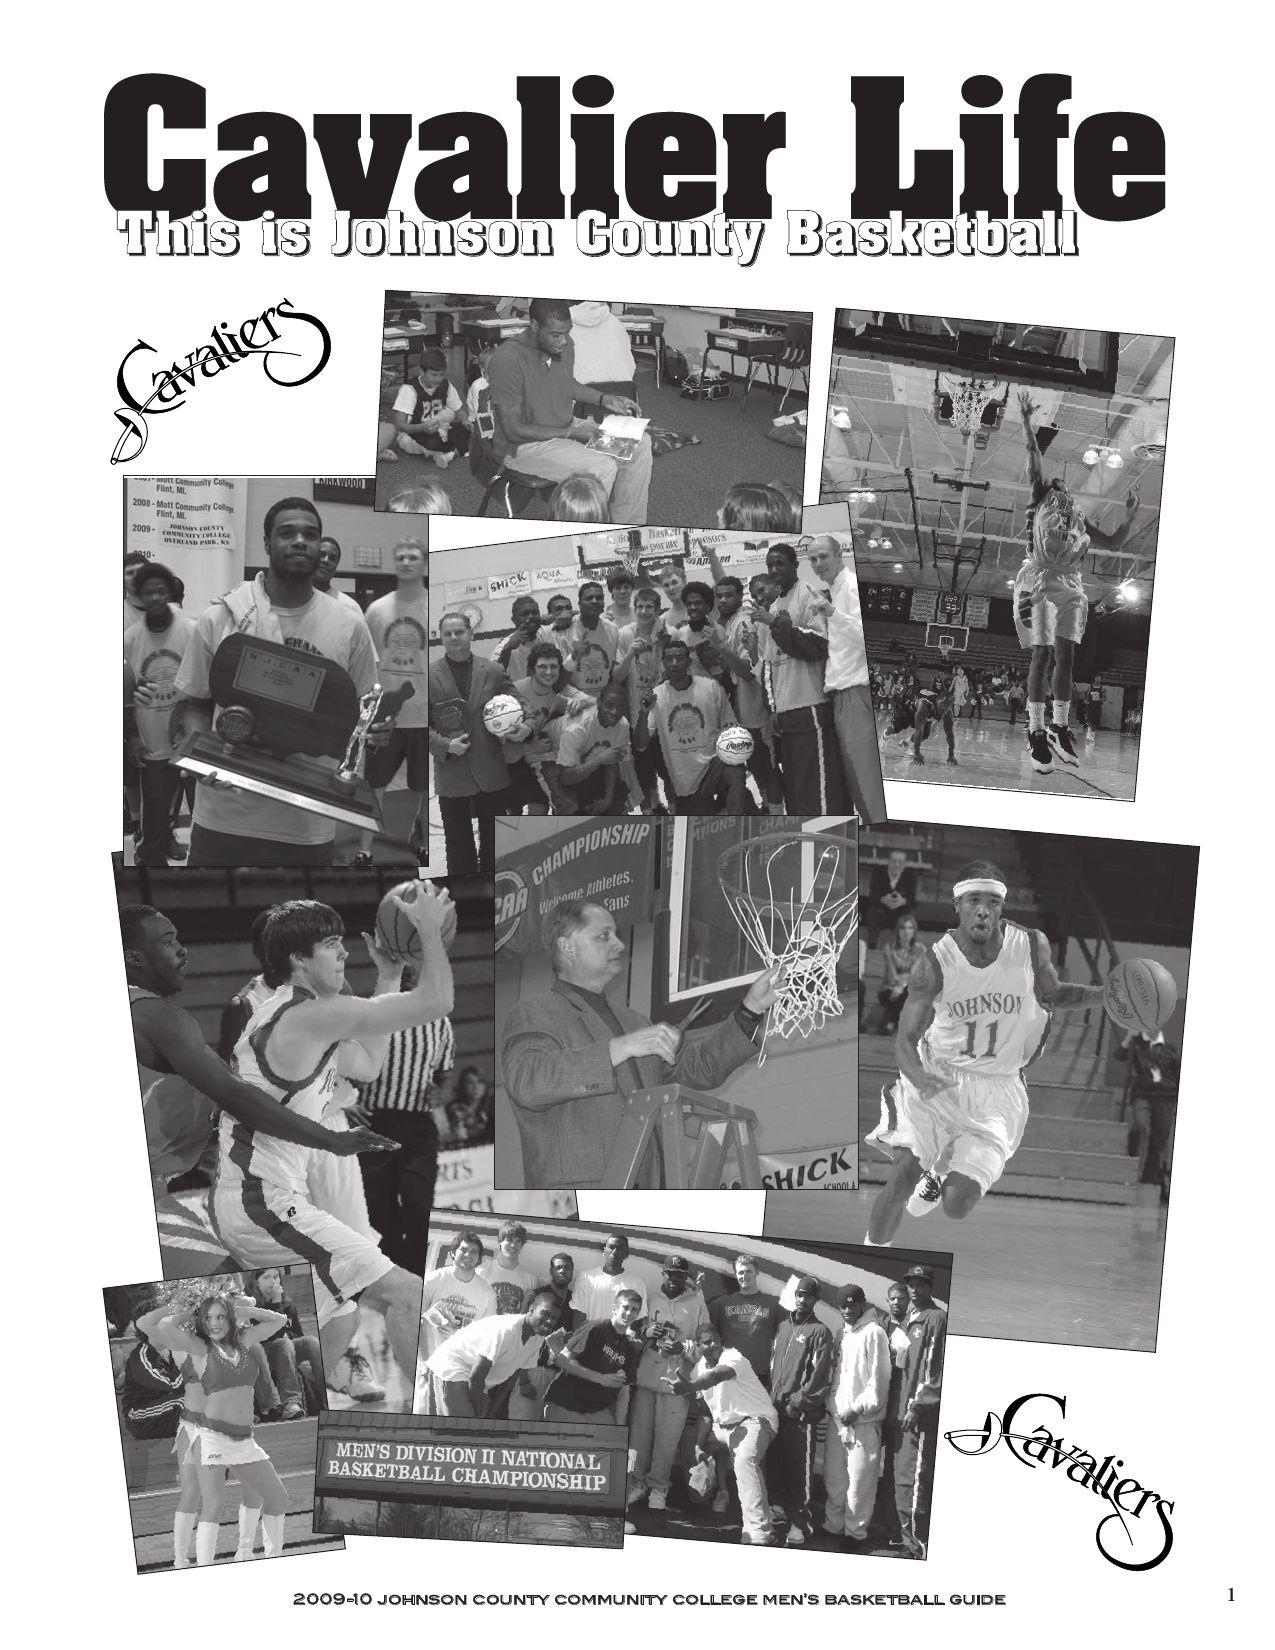 2009-10 JCCC Men's Basketball Media Guide by Chris Gray - issuu